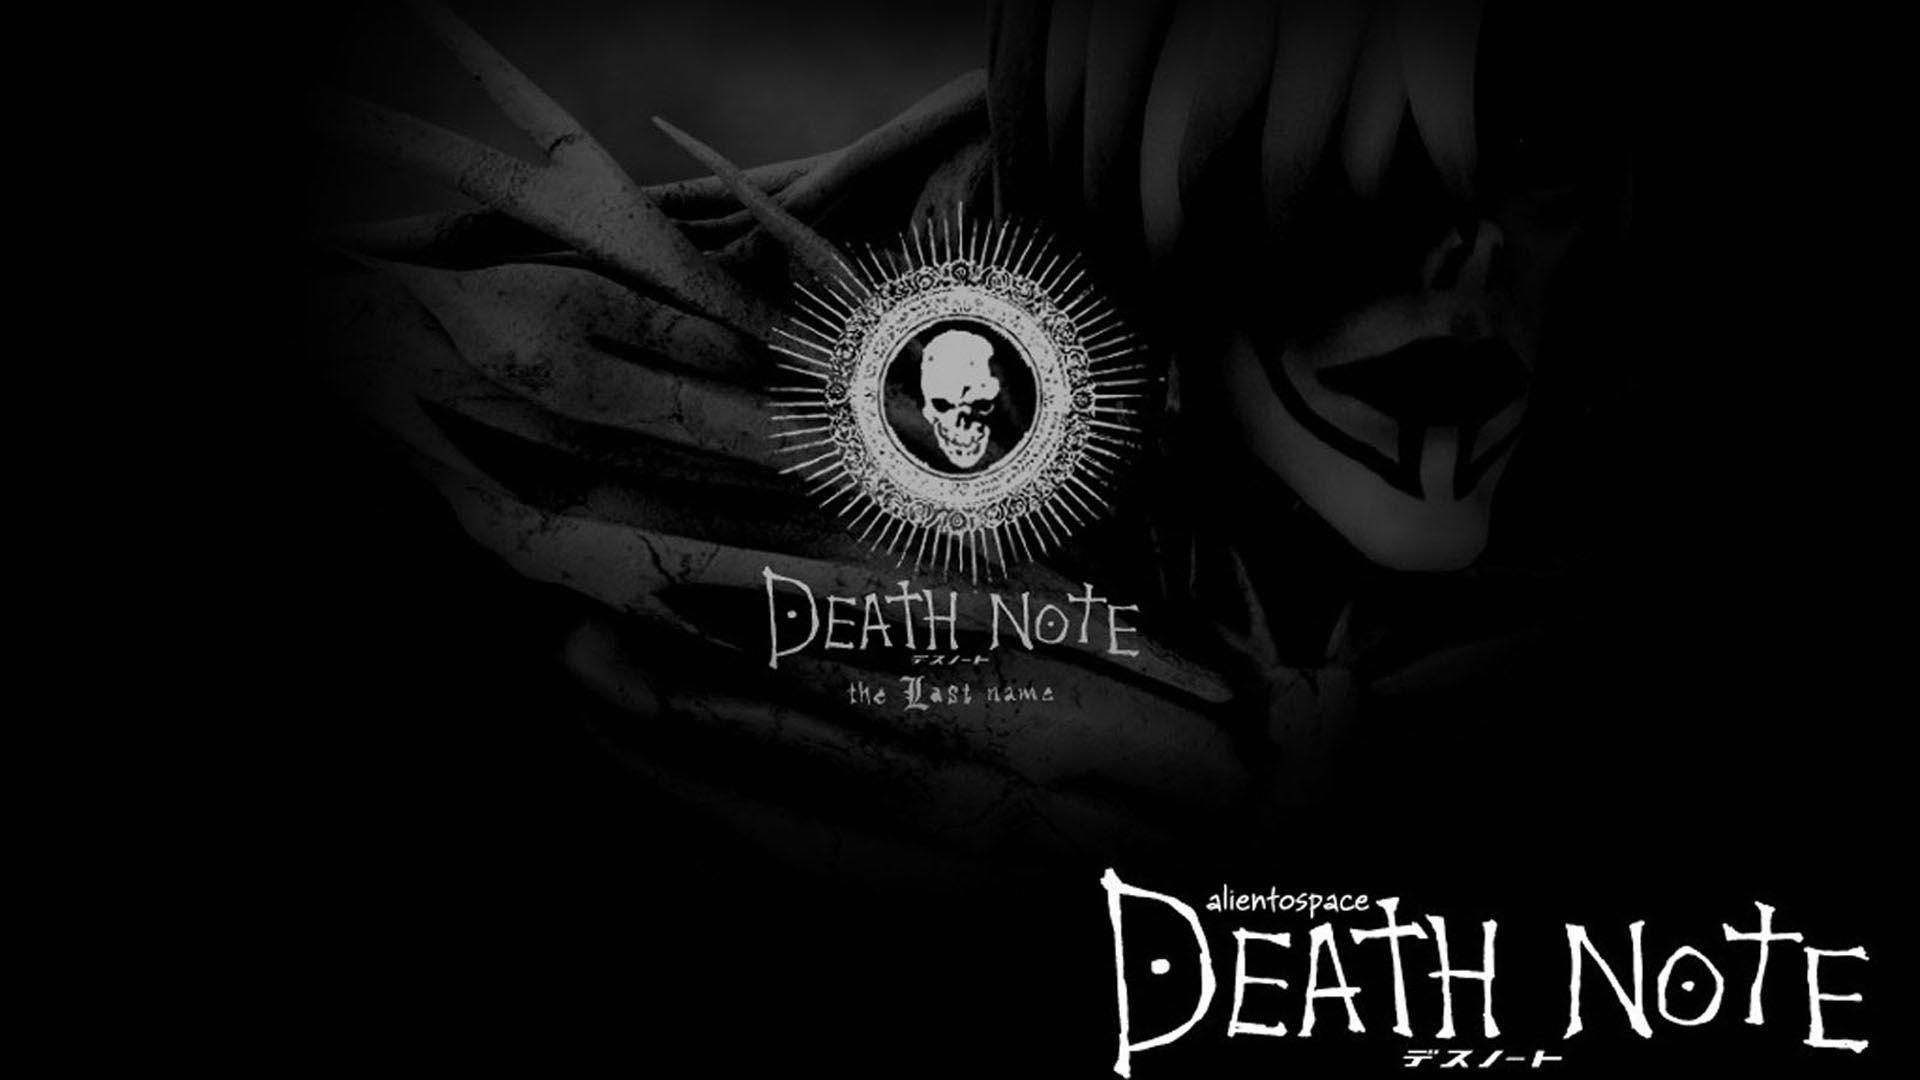 1920x1080 Death Note hình nền chất lượng cao